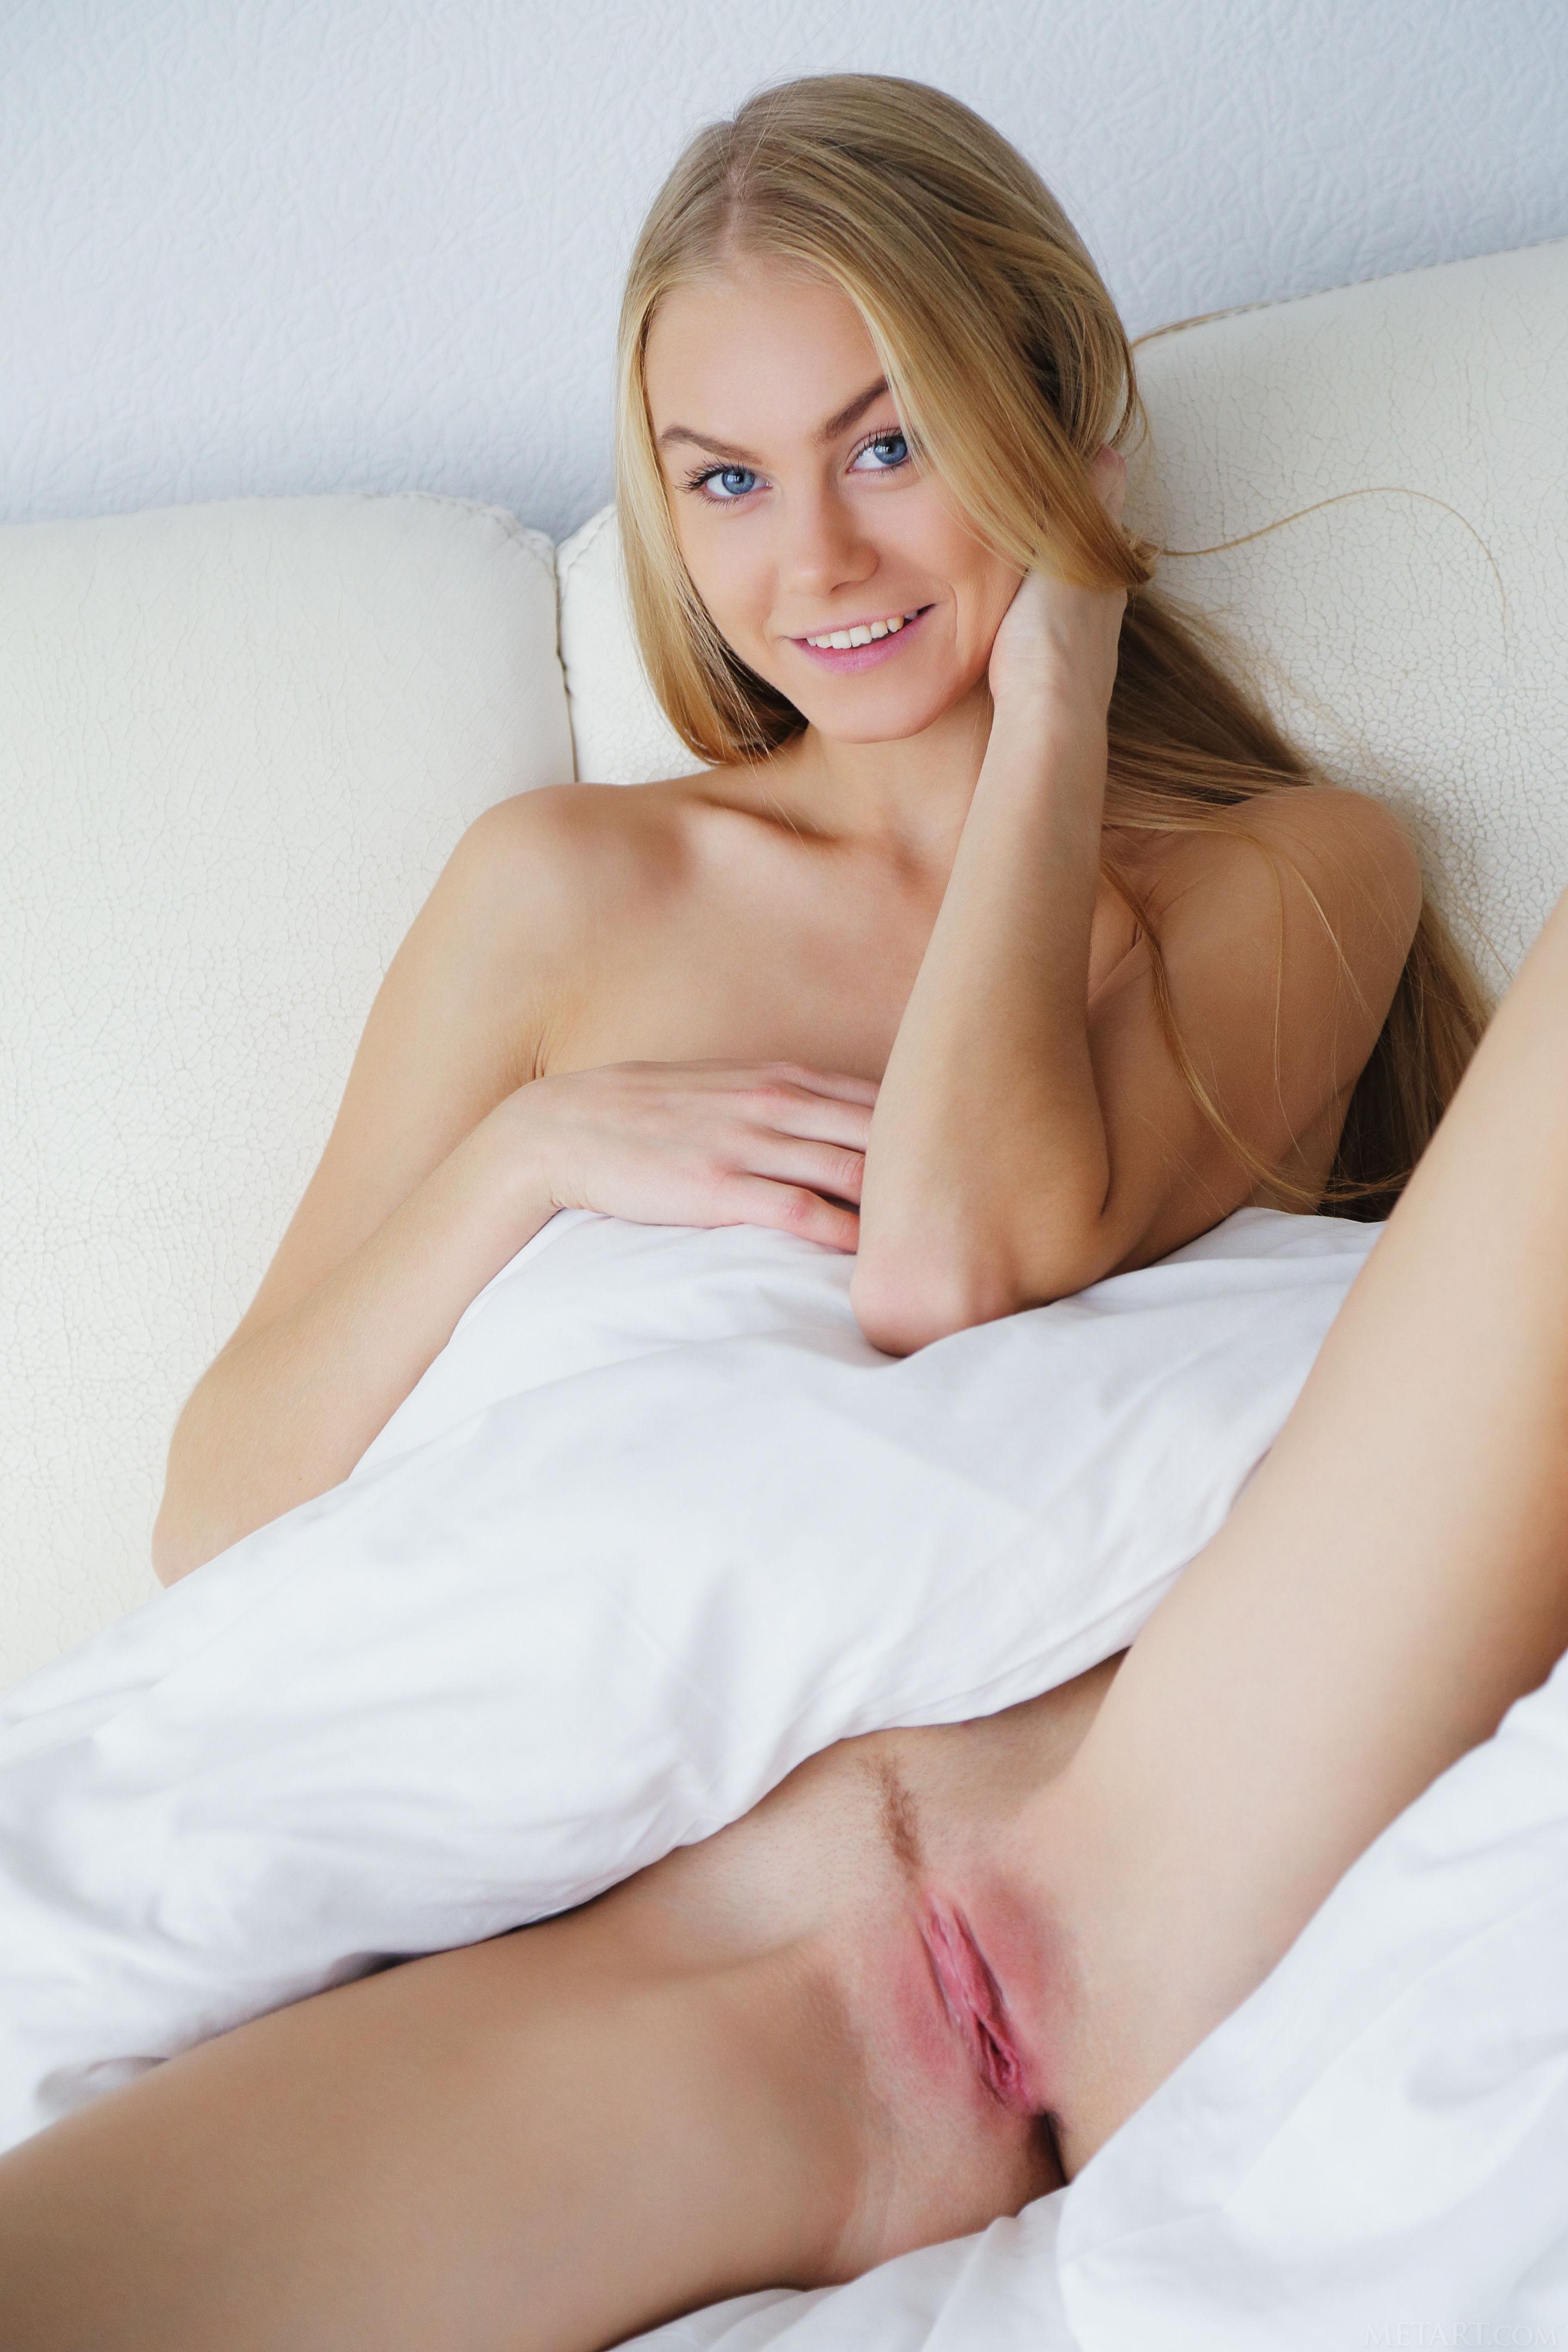 18 Virgin Sex - One Cock Goes